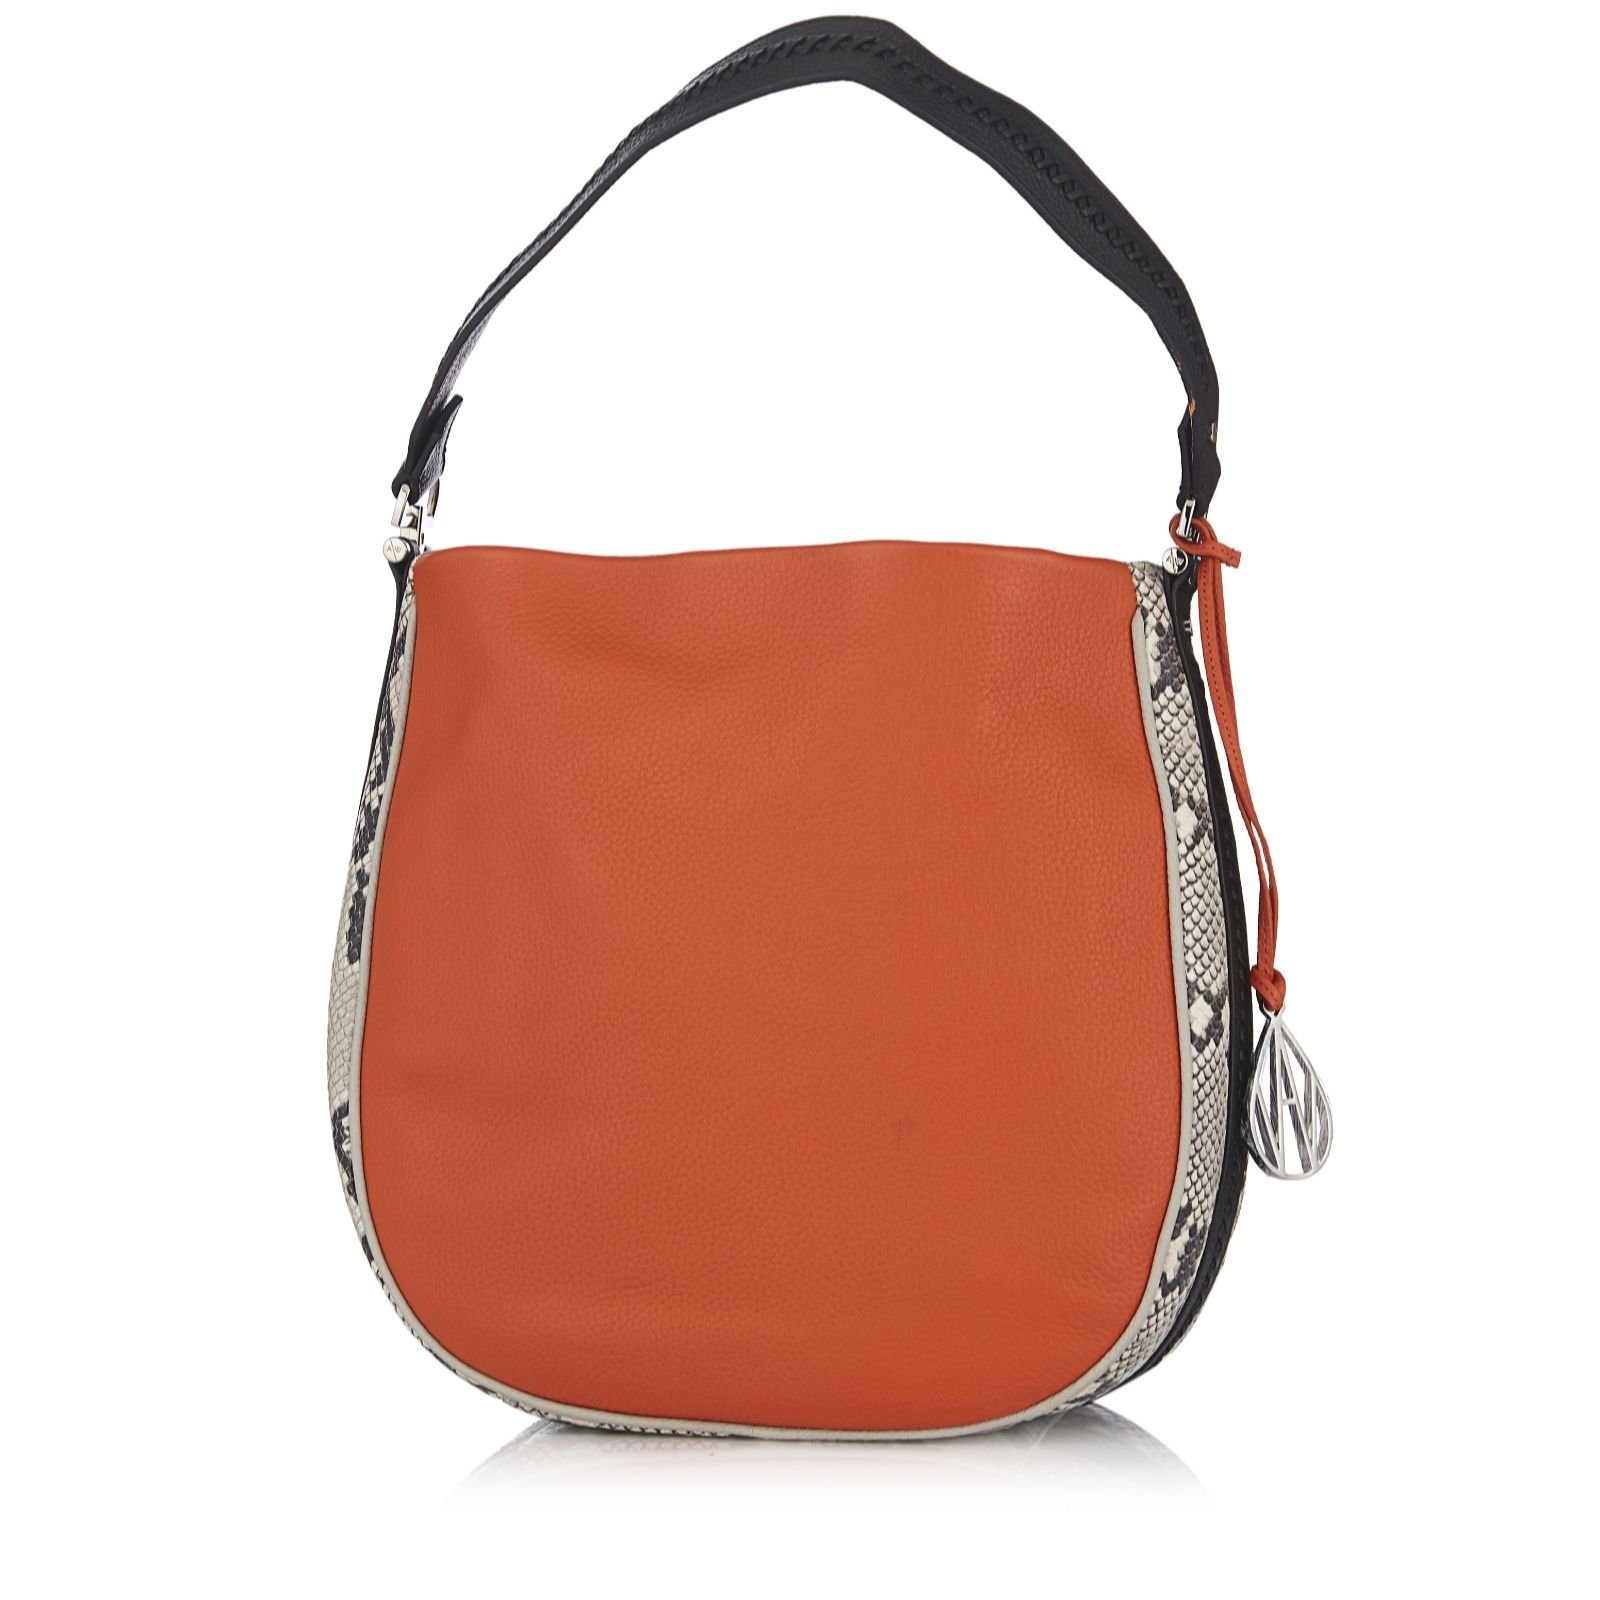 f92f84922 Amanda Wakeley The Midi Mara Leather Hobo Bag - QVC UK